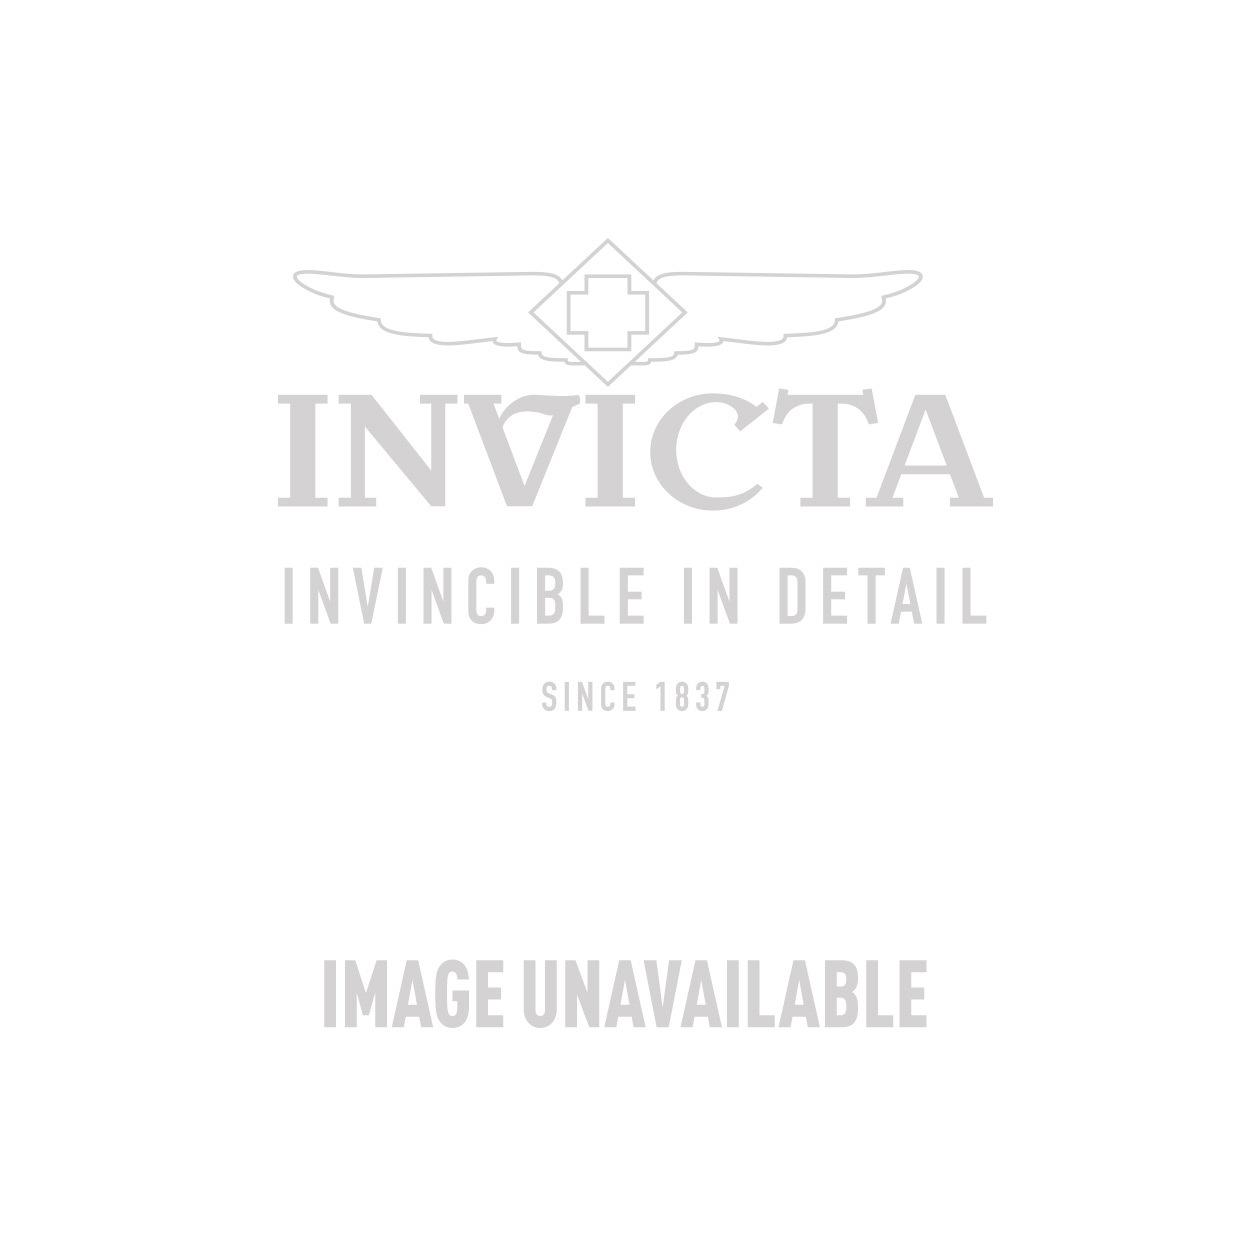 Invicta Corduba Swiss Movement Quartz Watch - Stainless Steel case with Black tone Polyurethane band - Model 80206